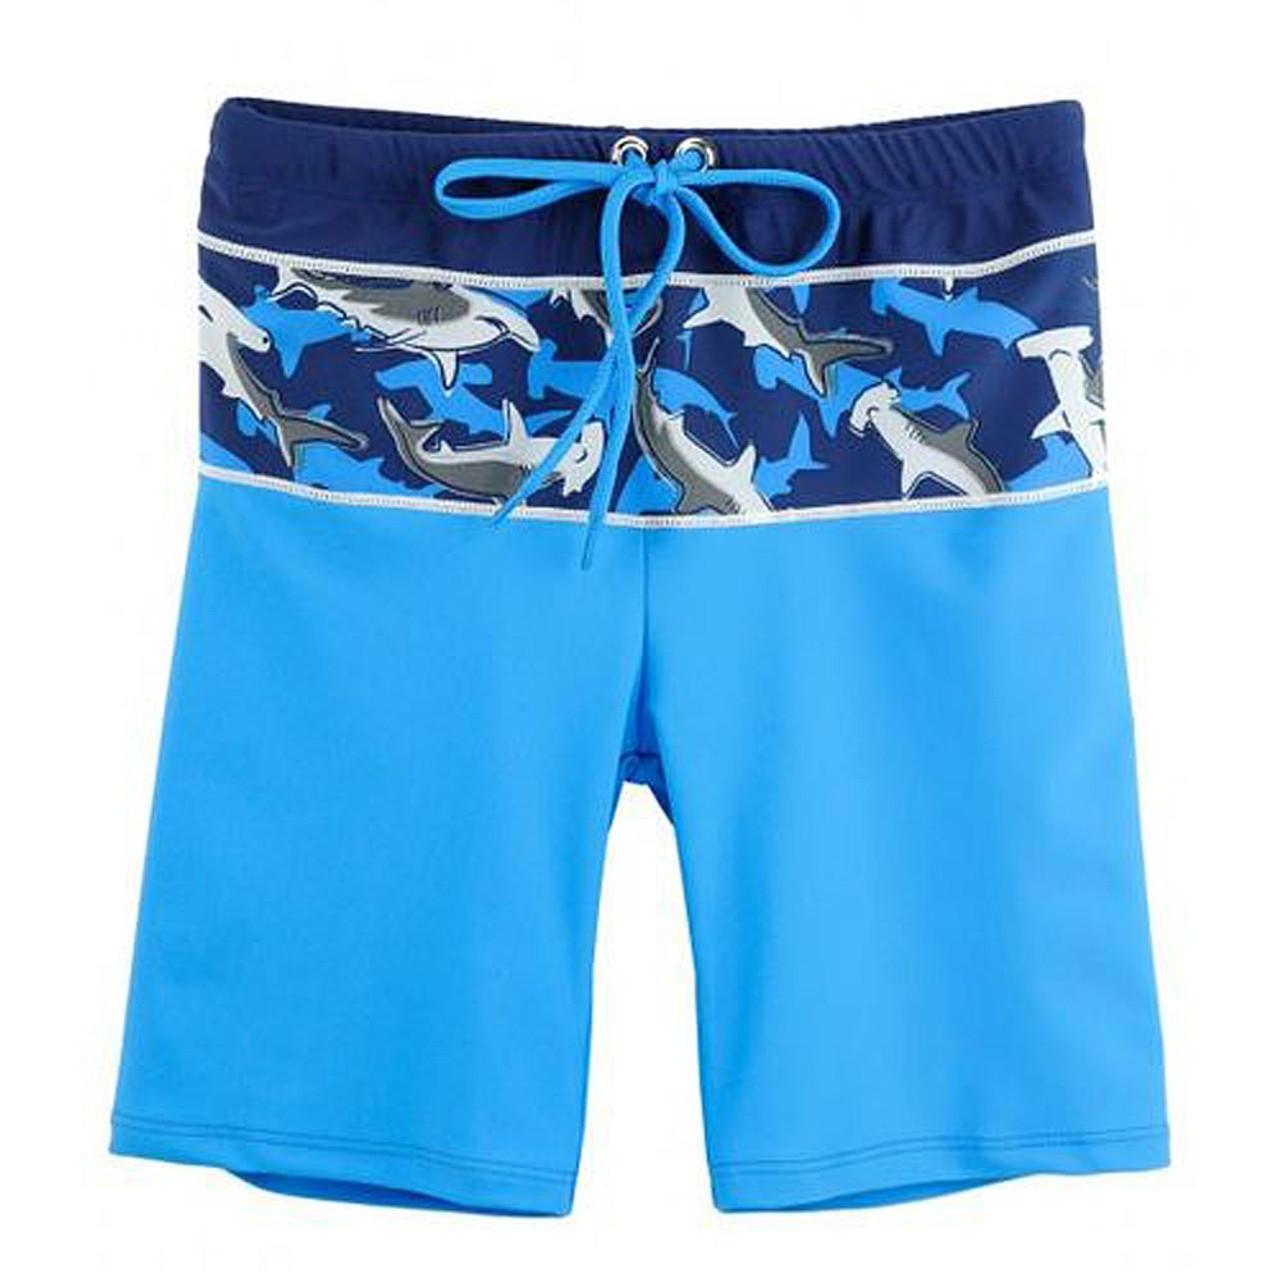 3308f112699c9 Boys Tuga 'South Swell' Board Shorts UPF50 Surf | Boys UV Clothing